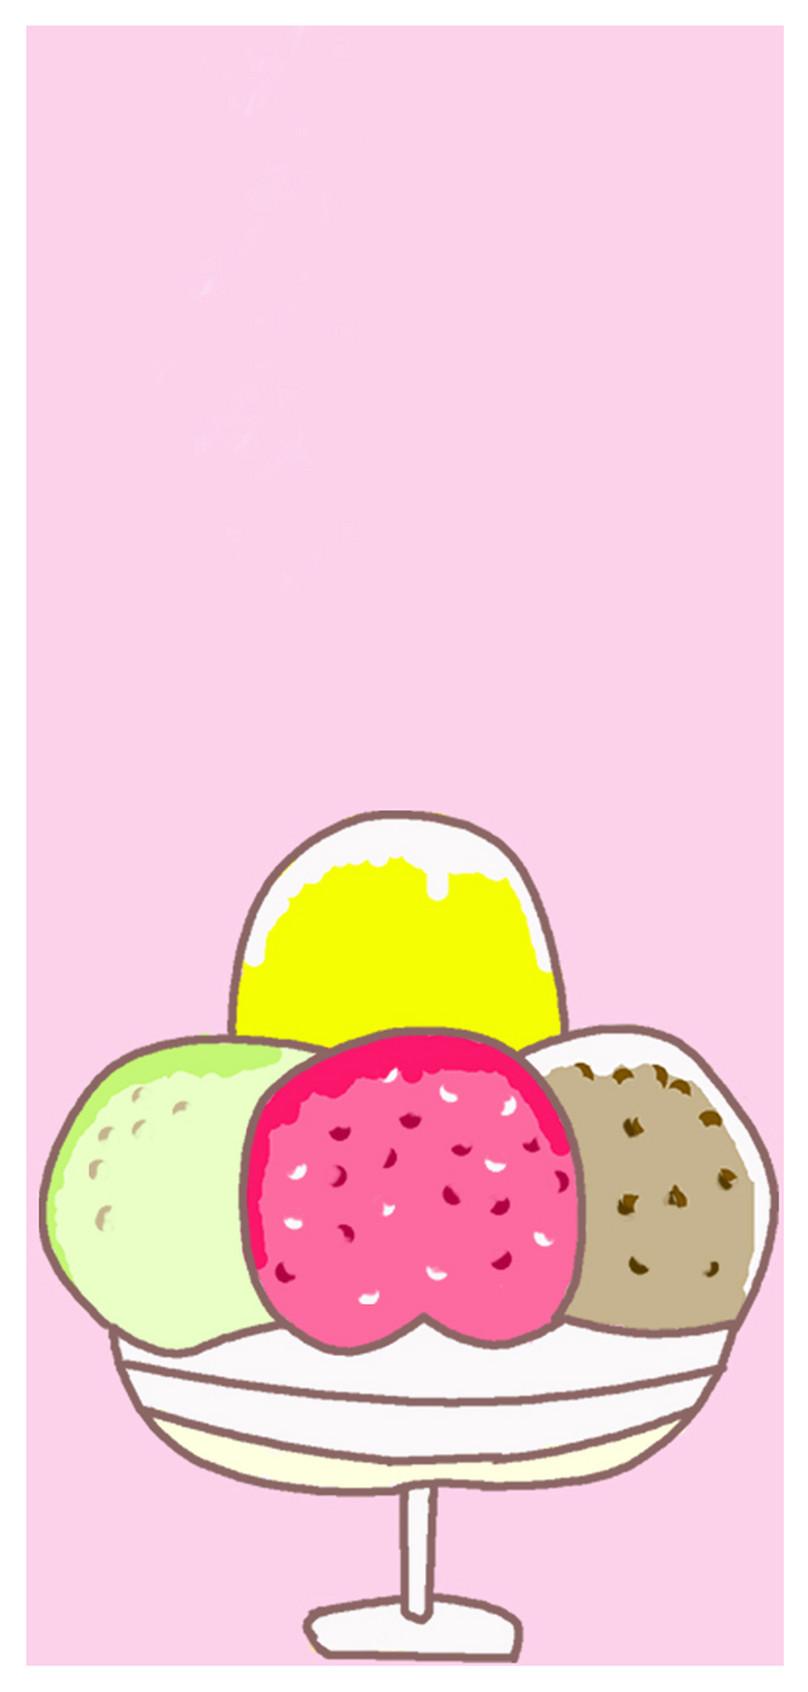 cartoon ice cream cellphone wallpaper cartoon ice cream cellphone wallpaper